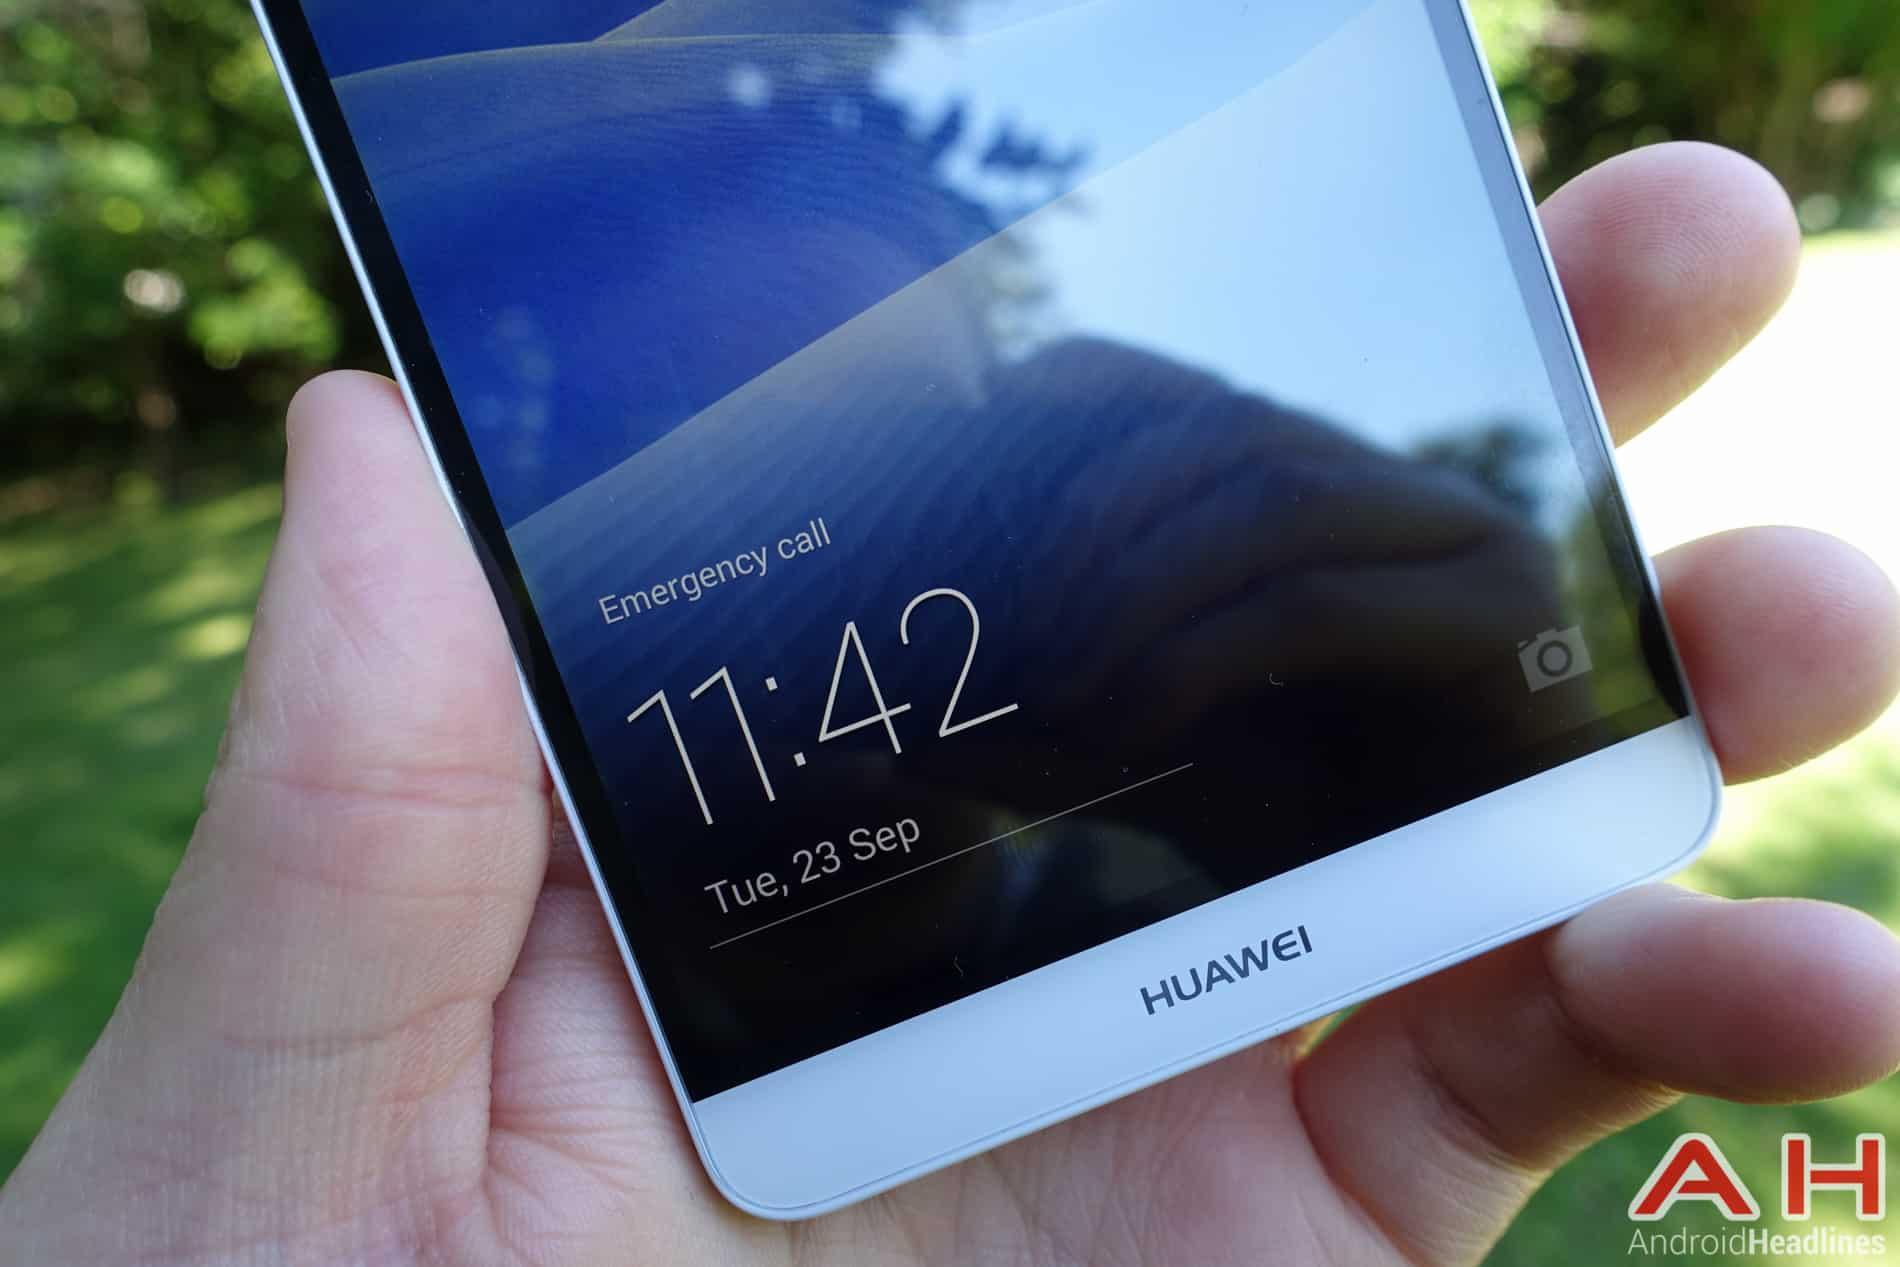 Huawei Ascend Mate 7 AH 27